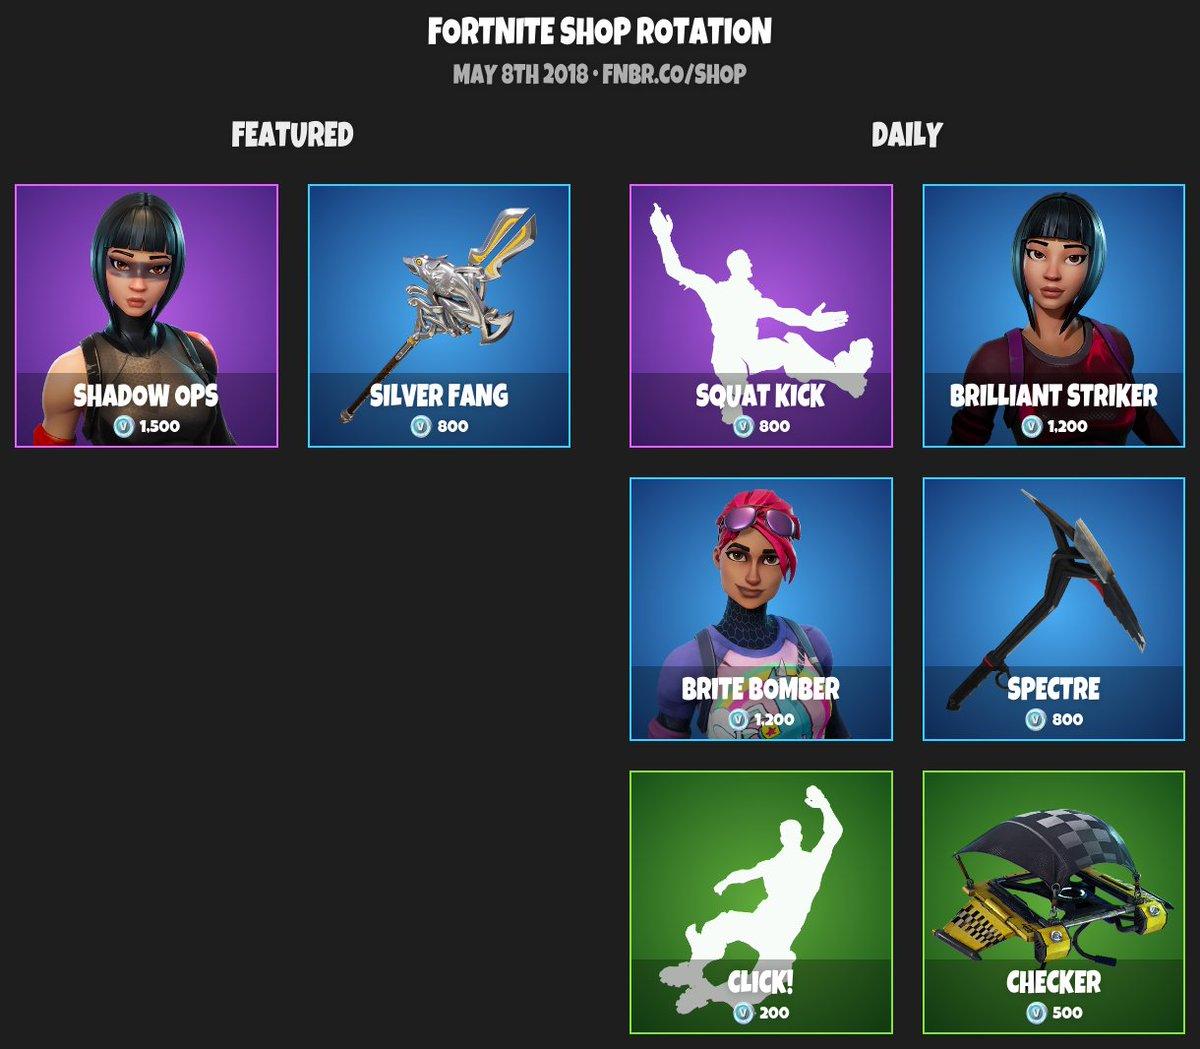 fortnite item shop news updates - fortnite item shop may 7